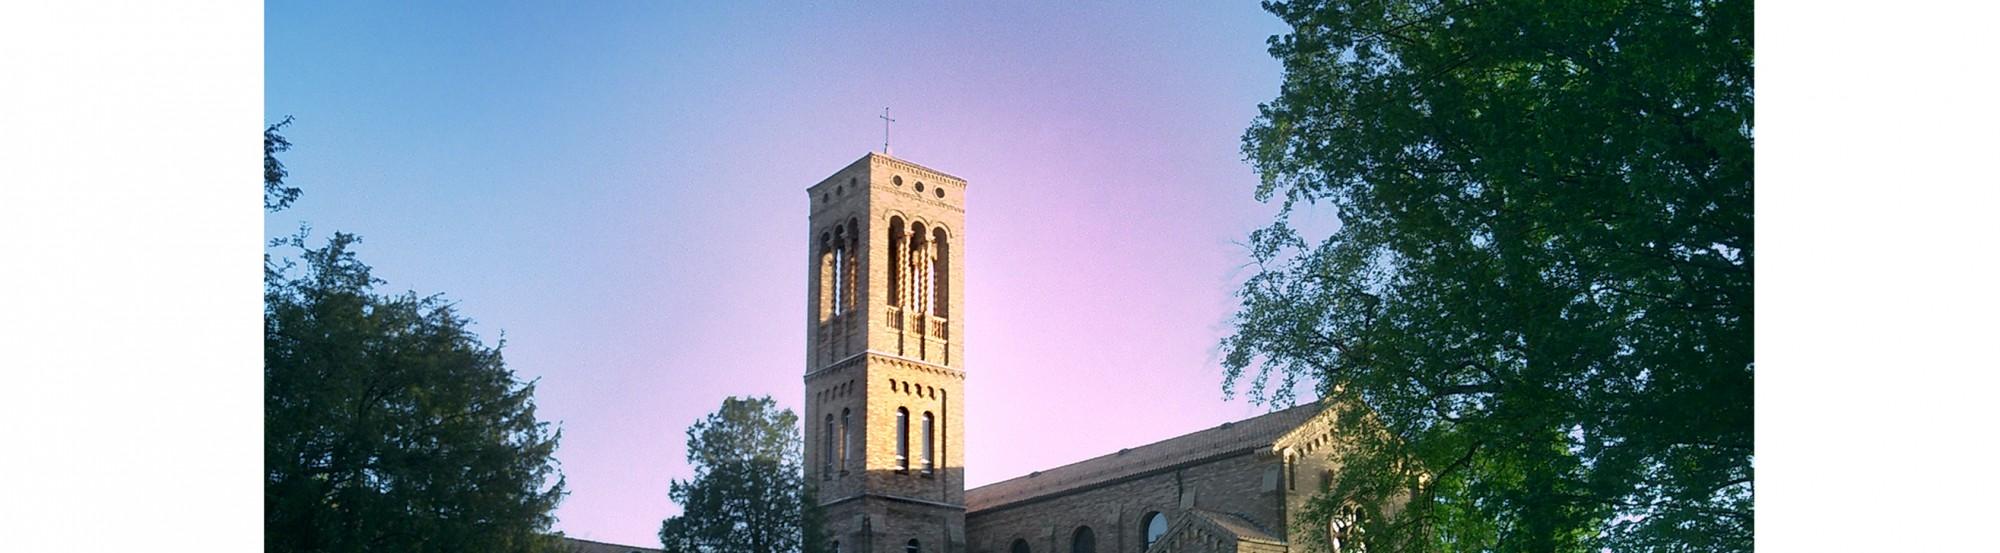 St. Joseph's Carmelite Monastery - St. Louis, Missouri